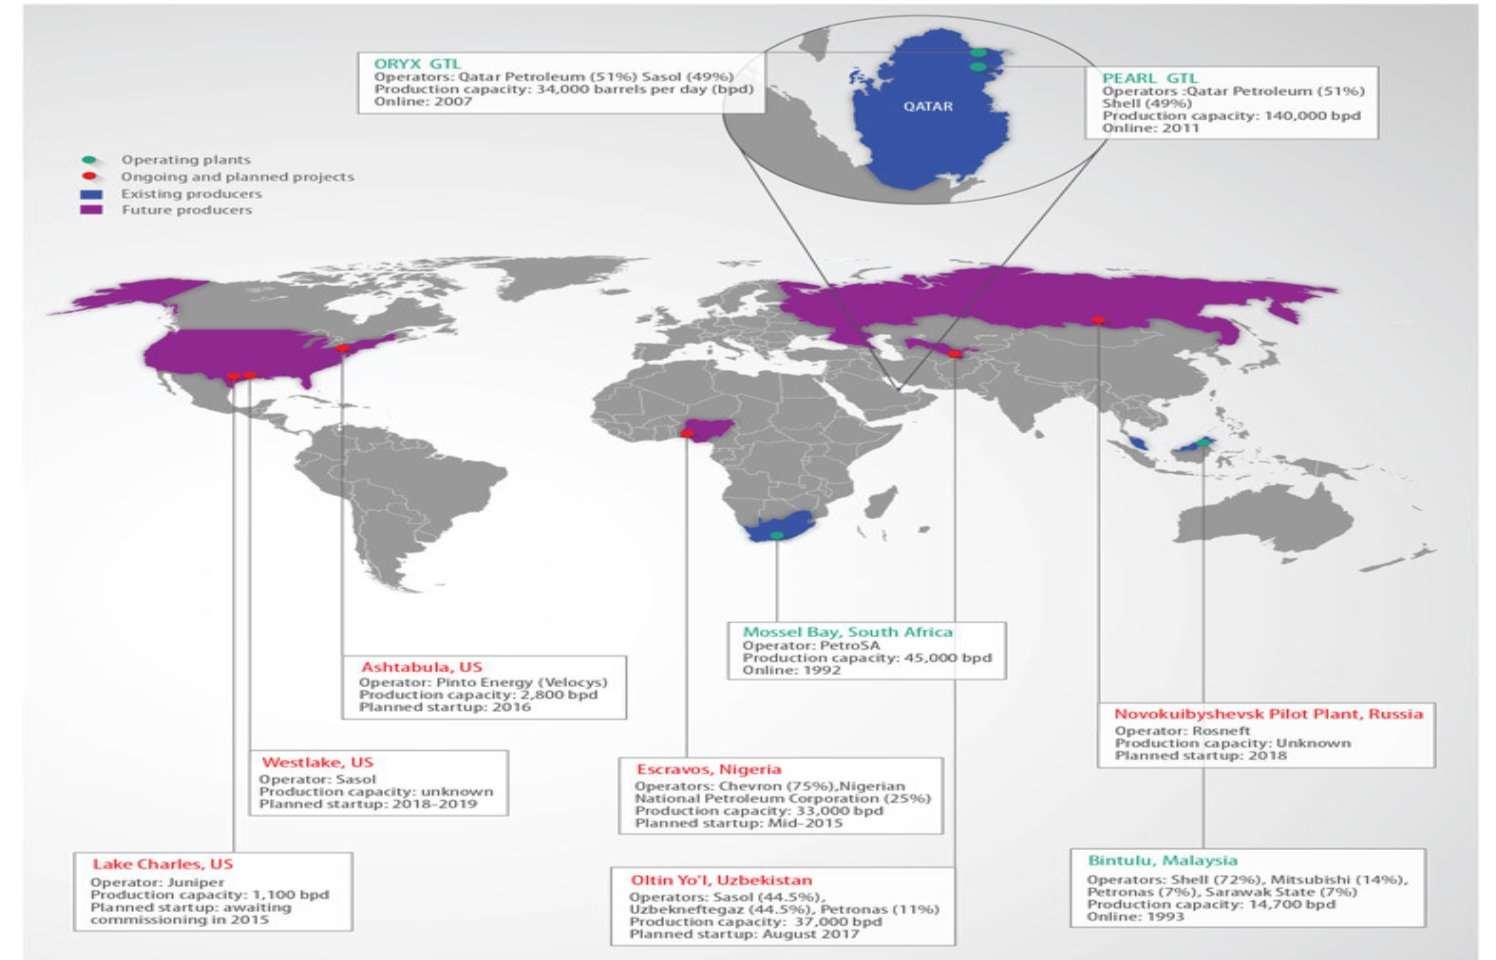 I_MAP_EXISTING_WORLD_GTL_CAPACITY_TOGY_QATAR_2015__19259.1445951649.jpg